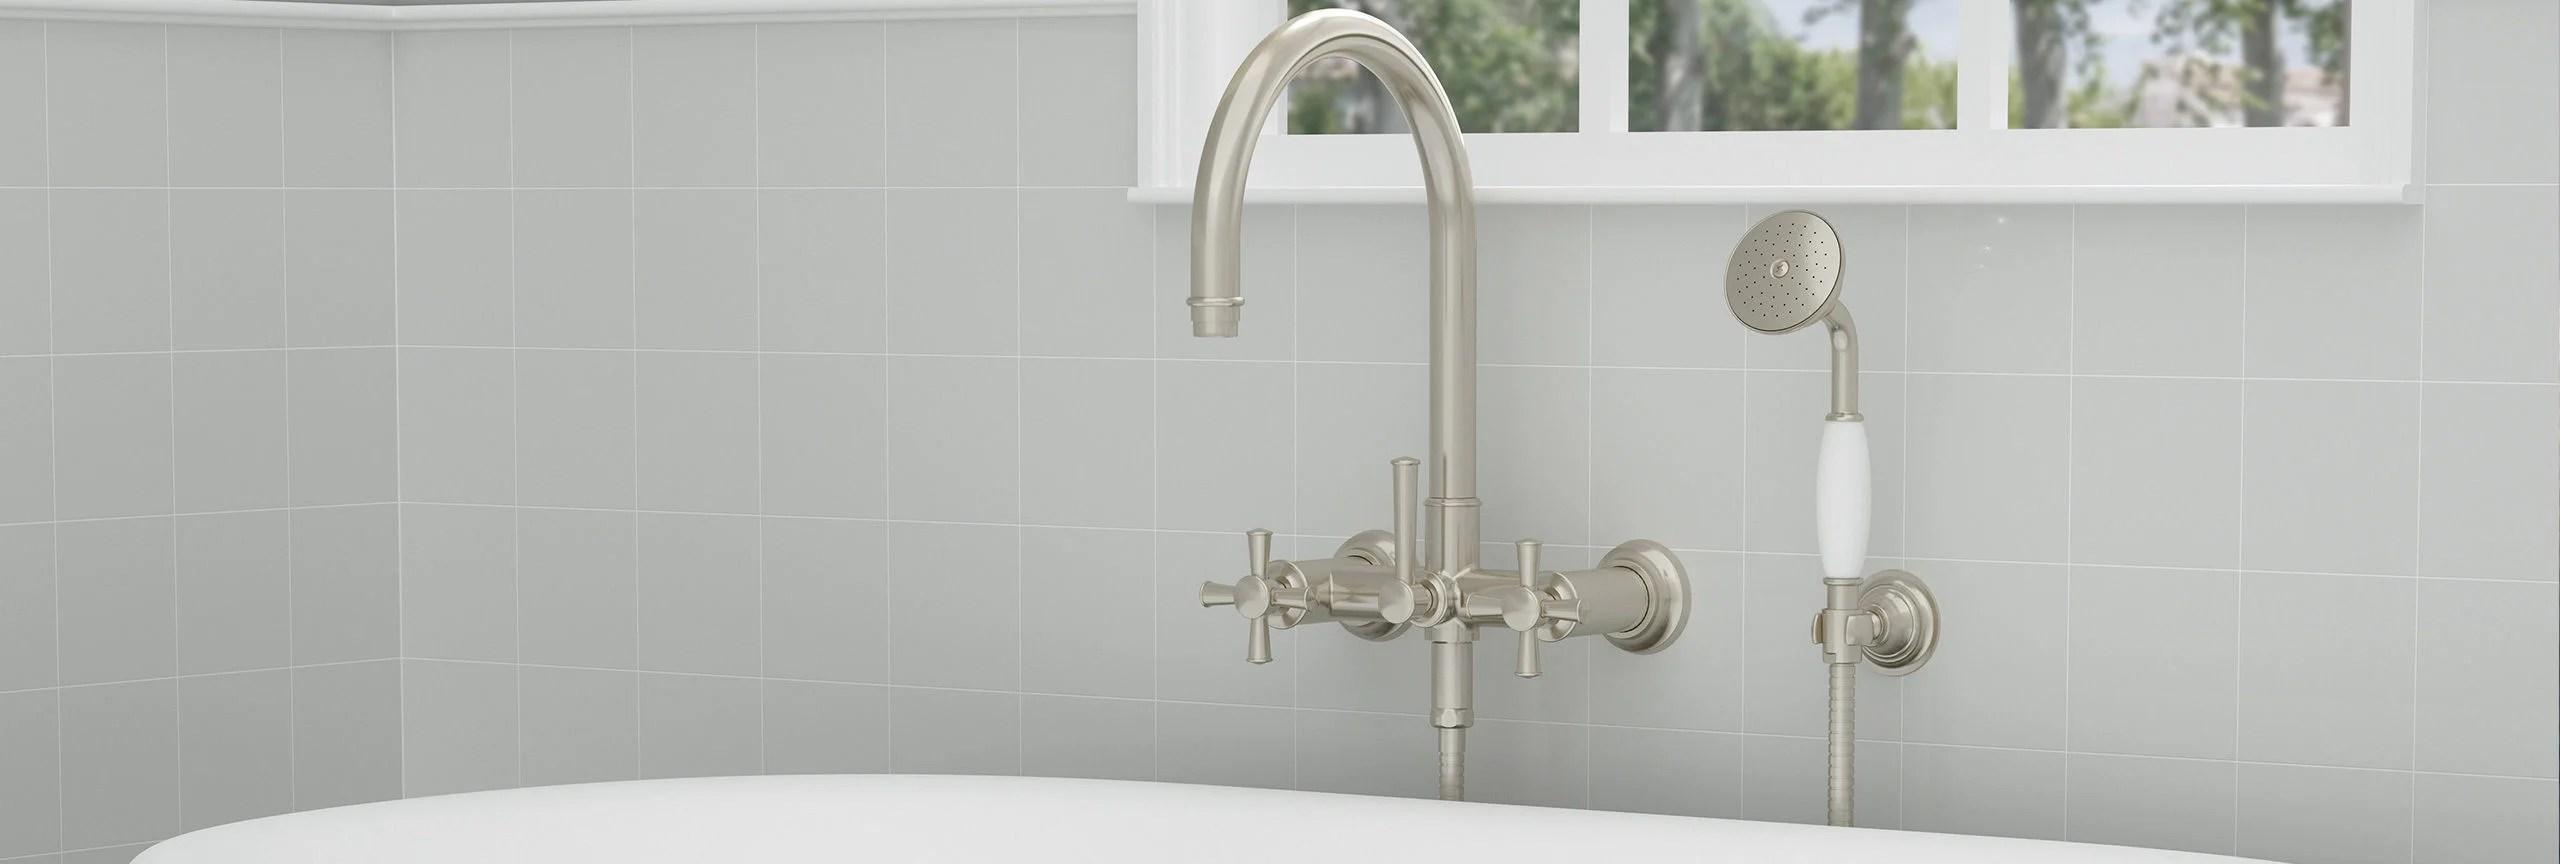 palomar tub fillers california faucets